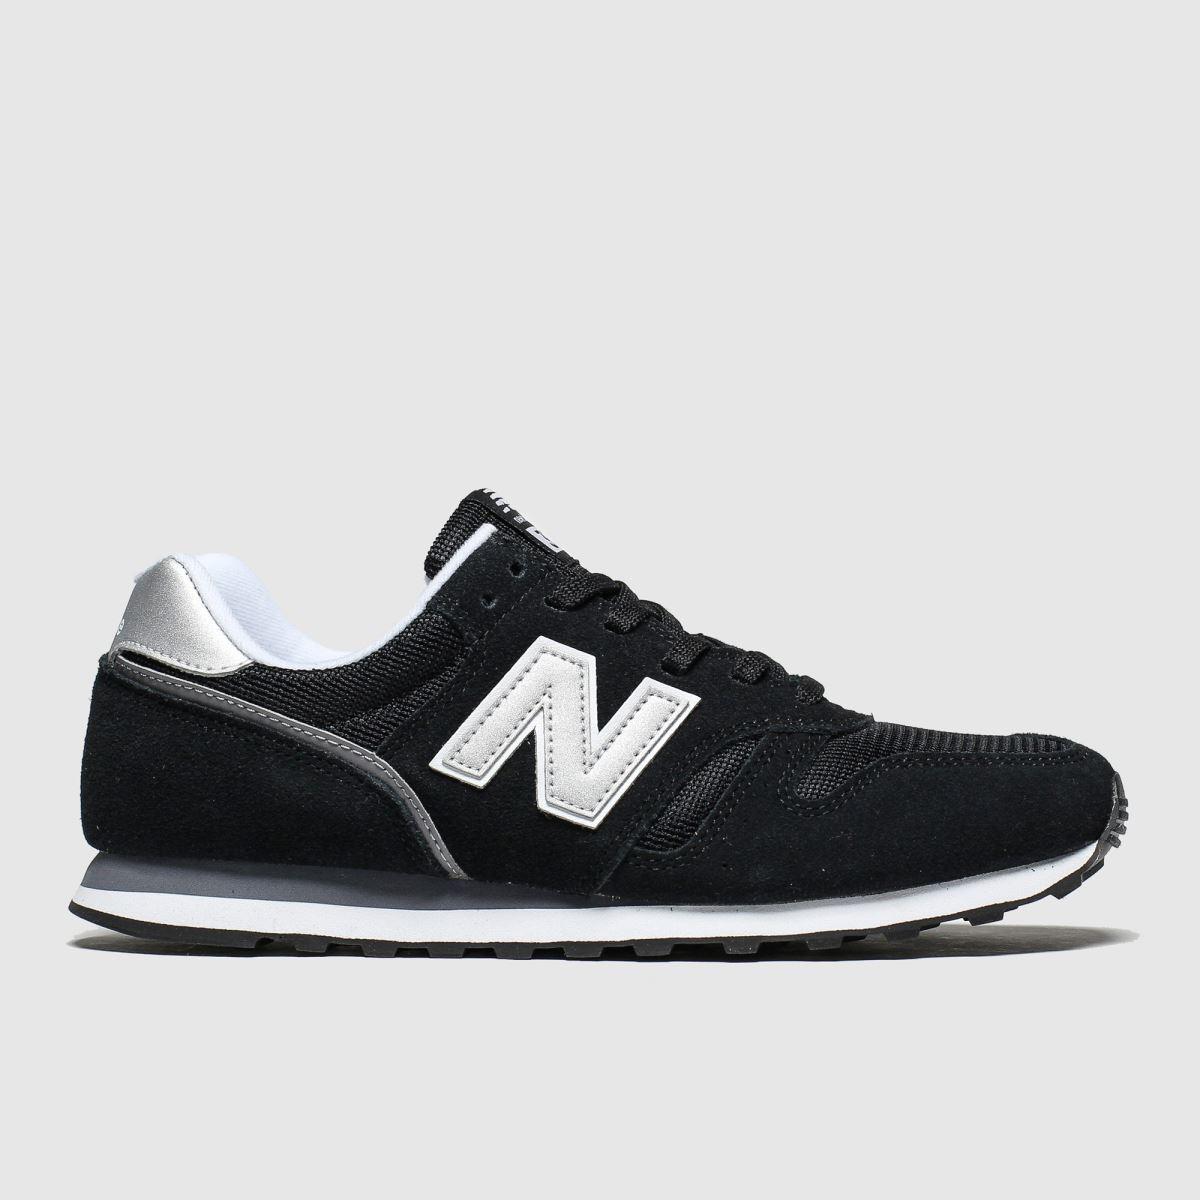 New Balance New Balance Black & Silver 373 V2 Trainers